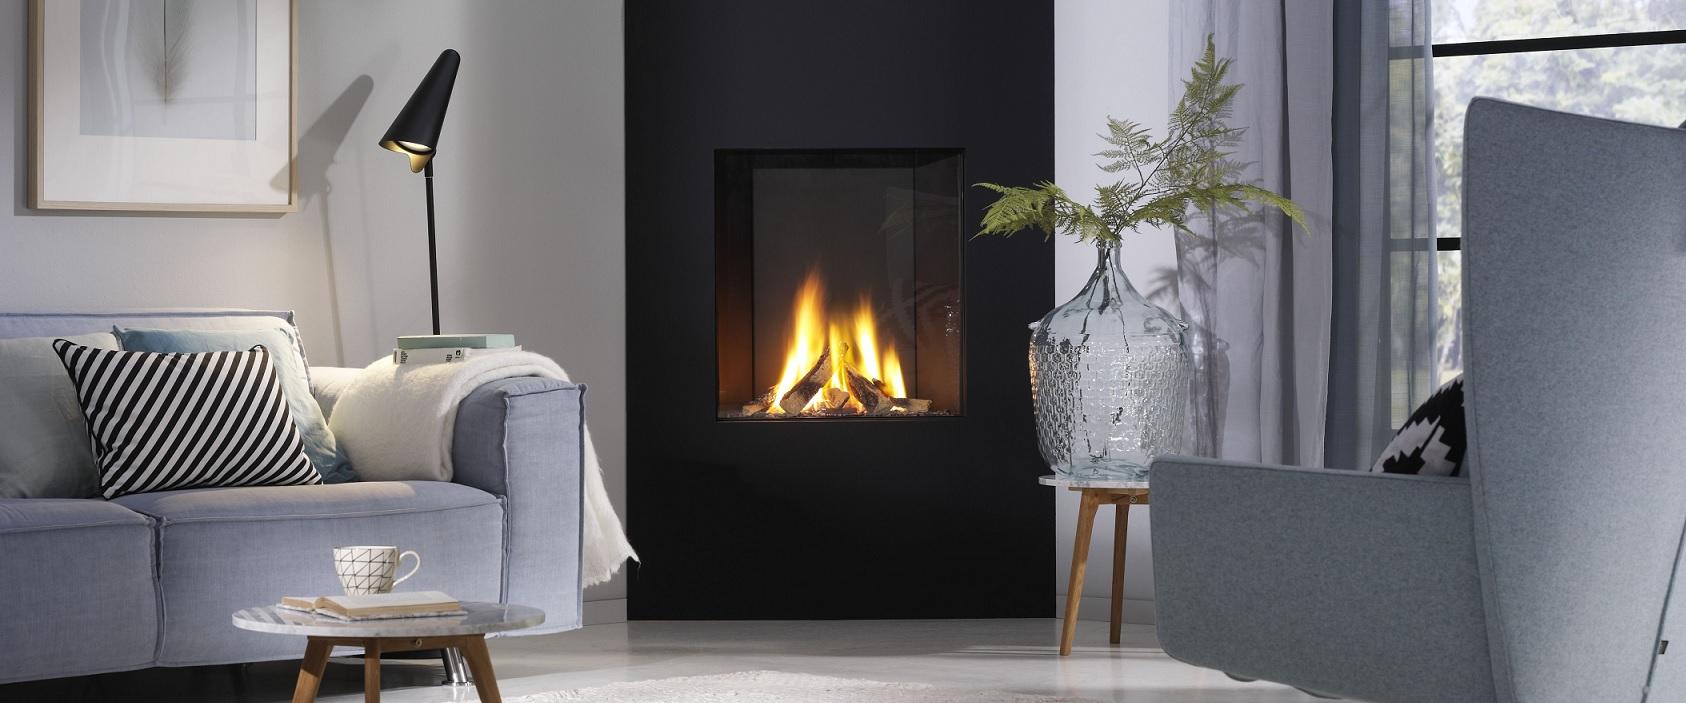 Discover Trimline Fires unique build-in possibilities